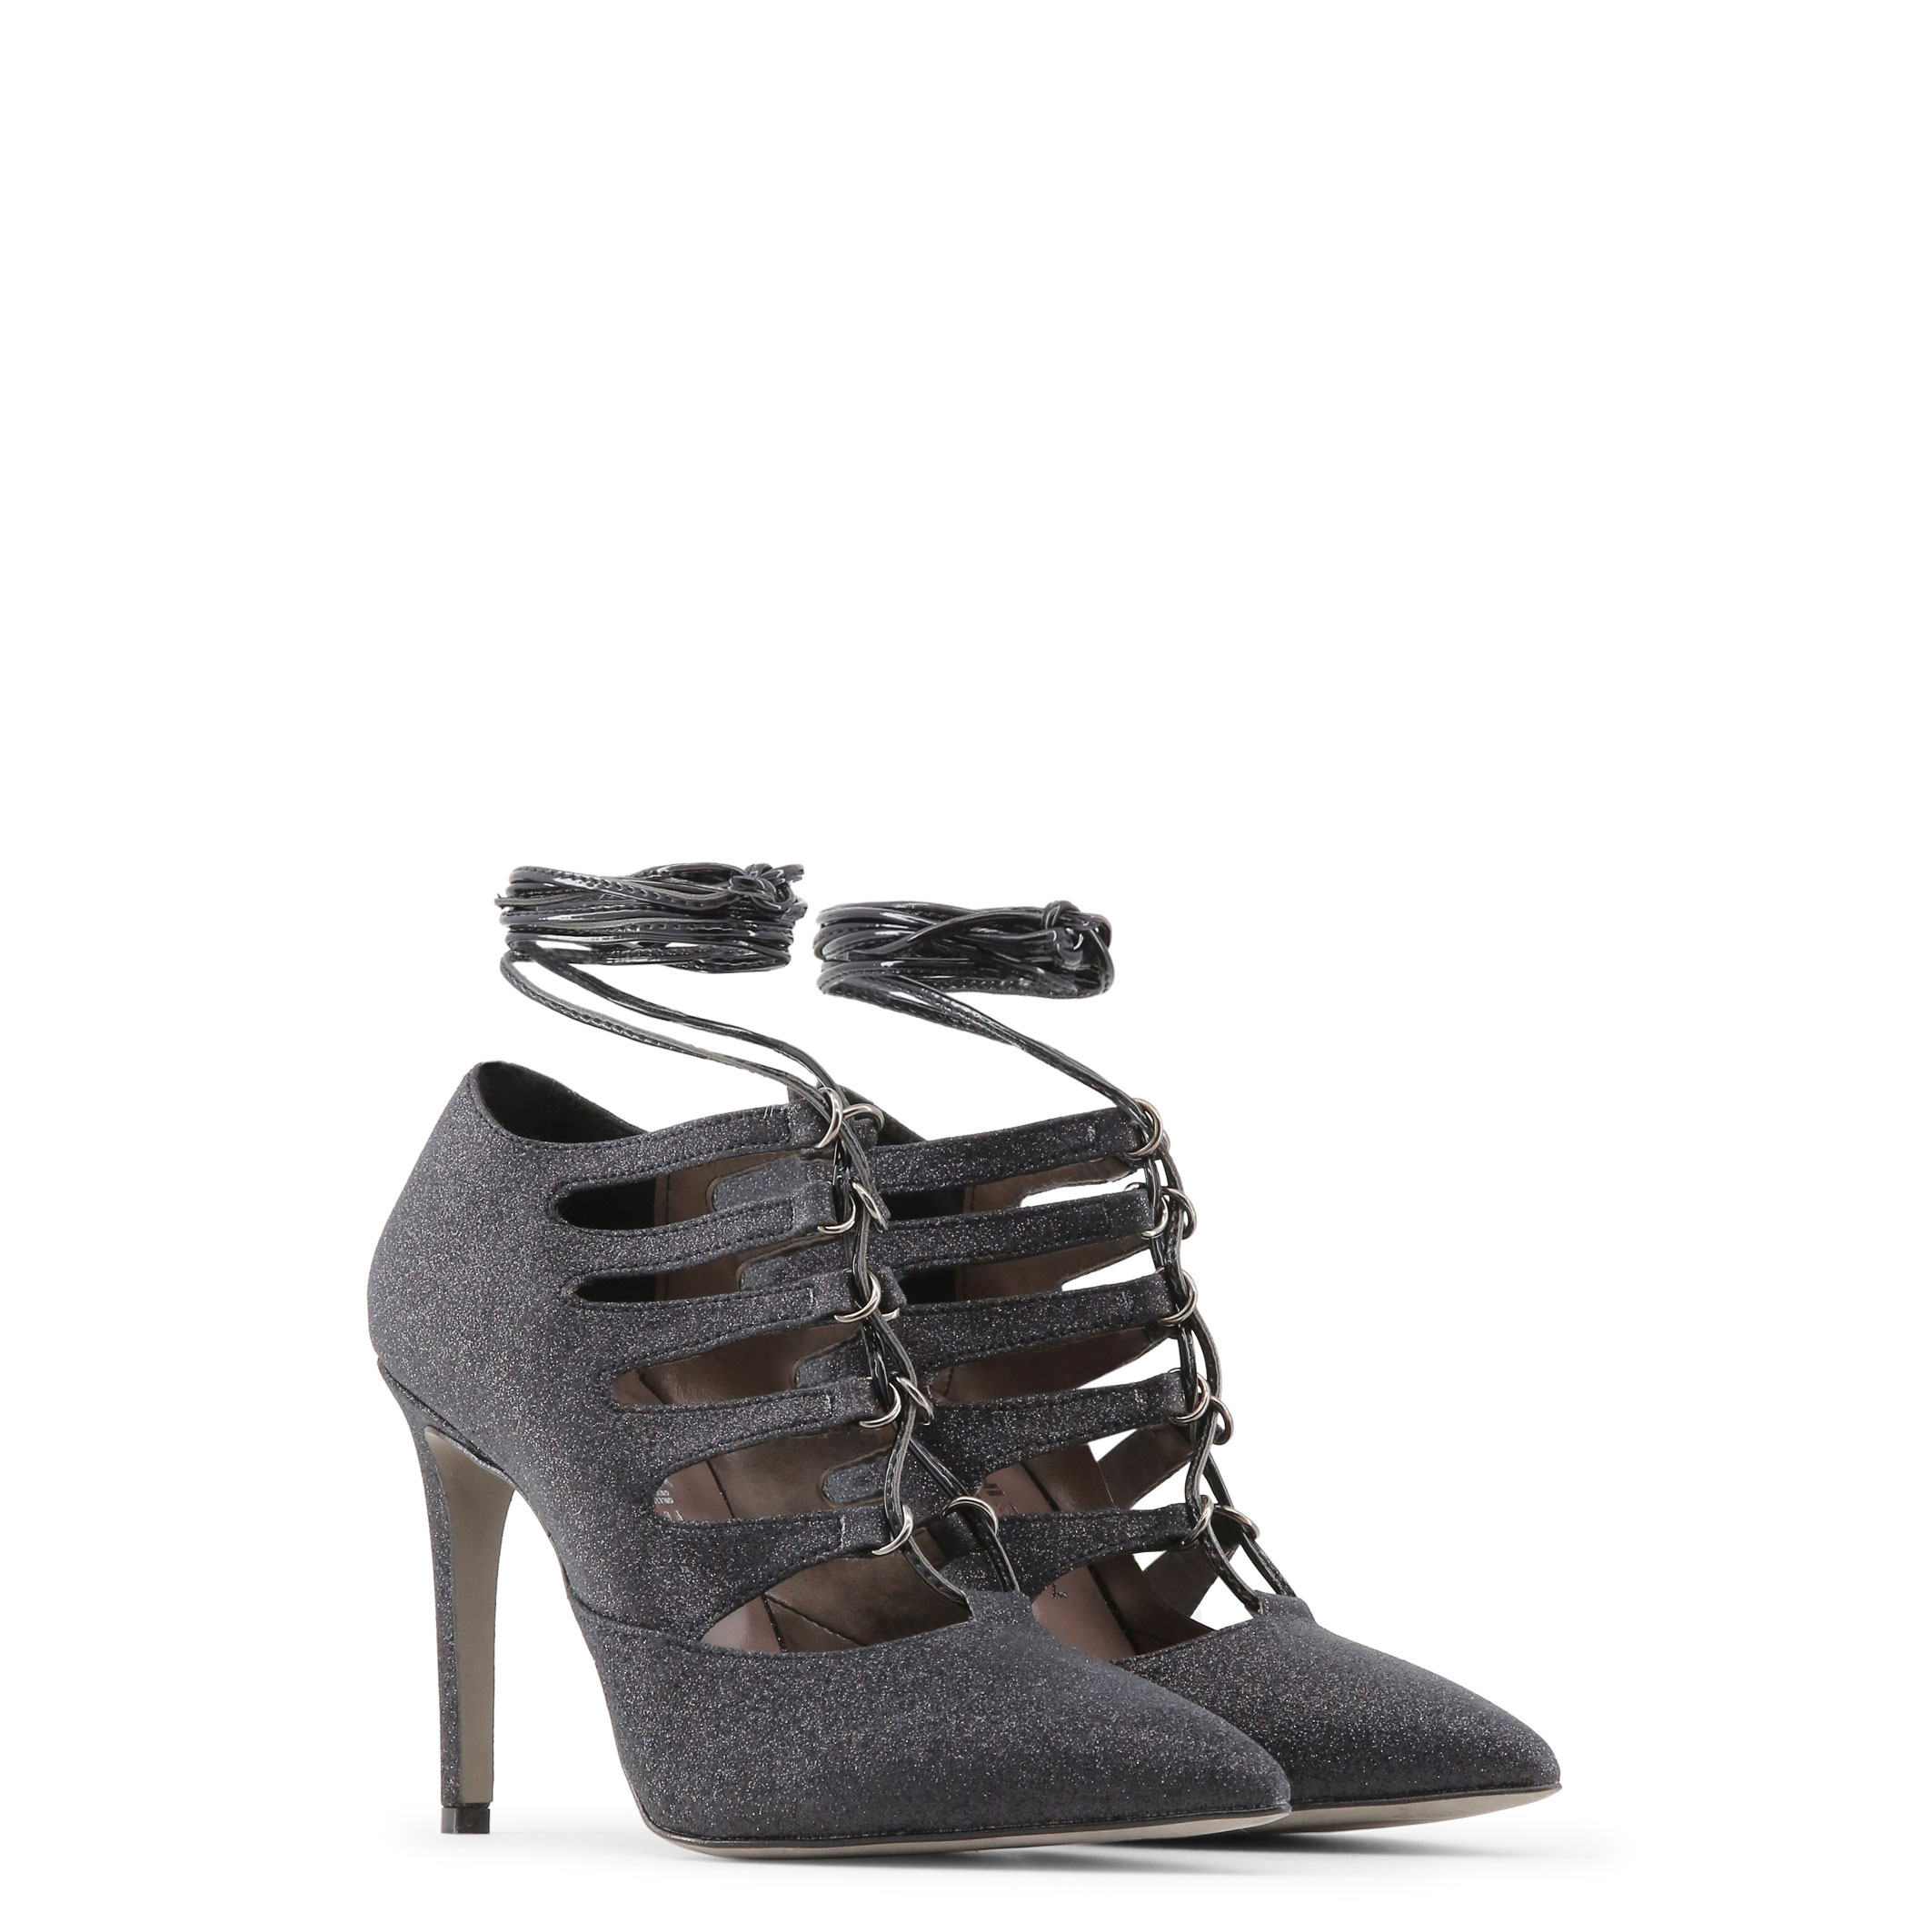 Schuhe MORGANA, Damen Schwarz/Schwarz High Heels Schwarz/Schwarz Damen pumps hochzeit 2d24e1